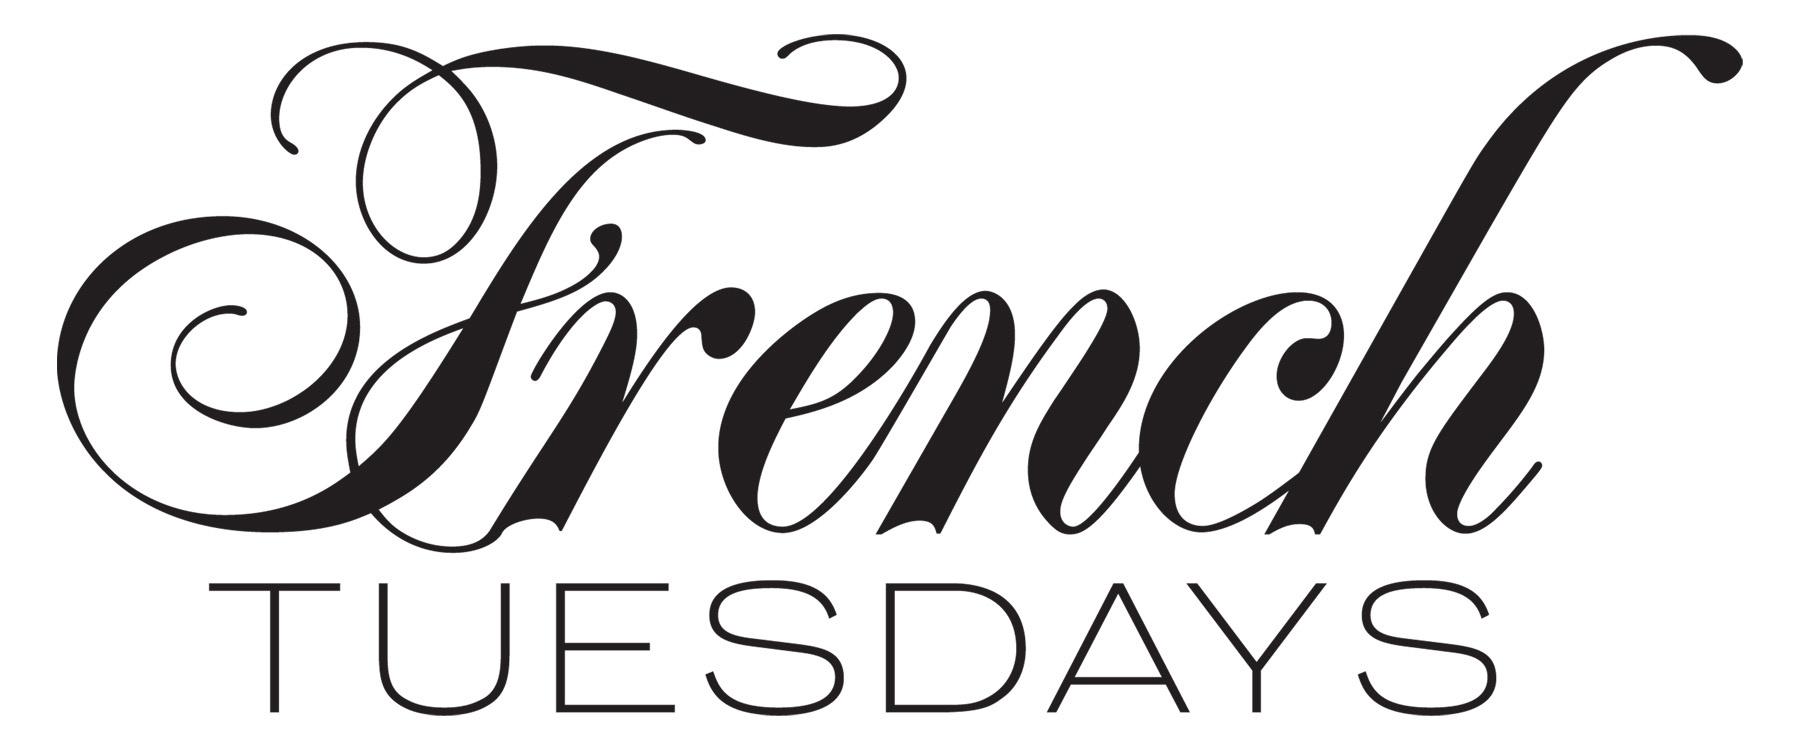 French Tuesdays Logo